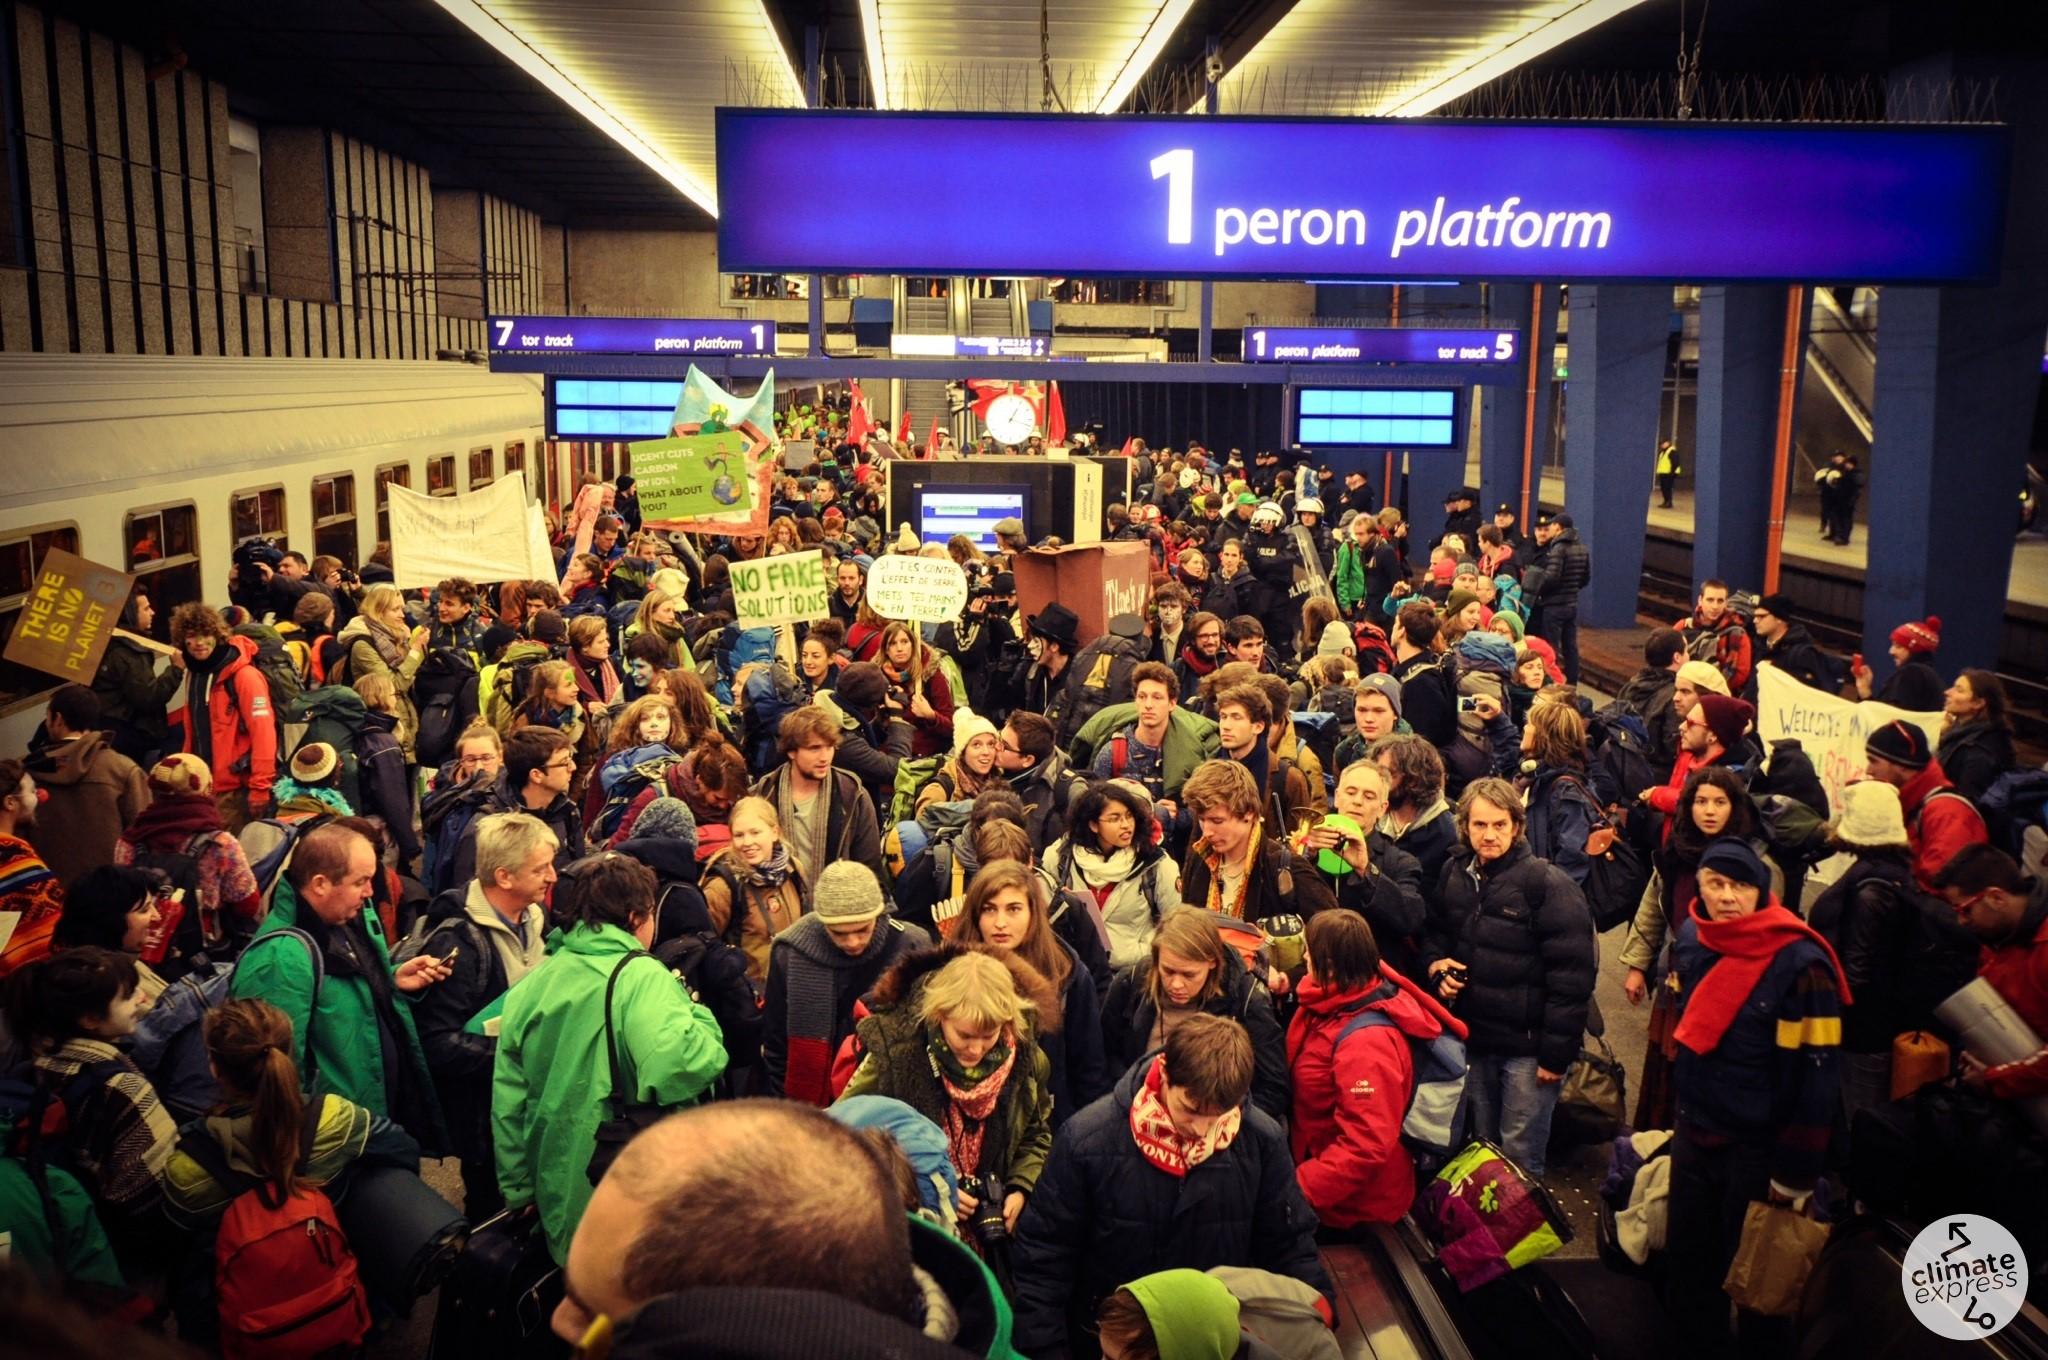 2013: De trein naar Warschau